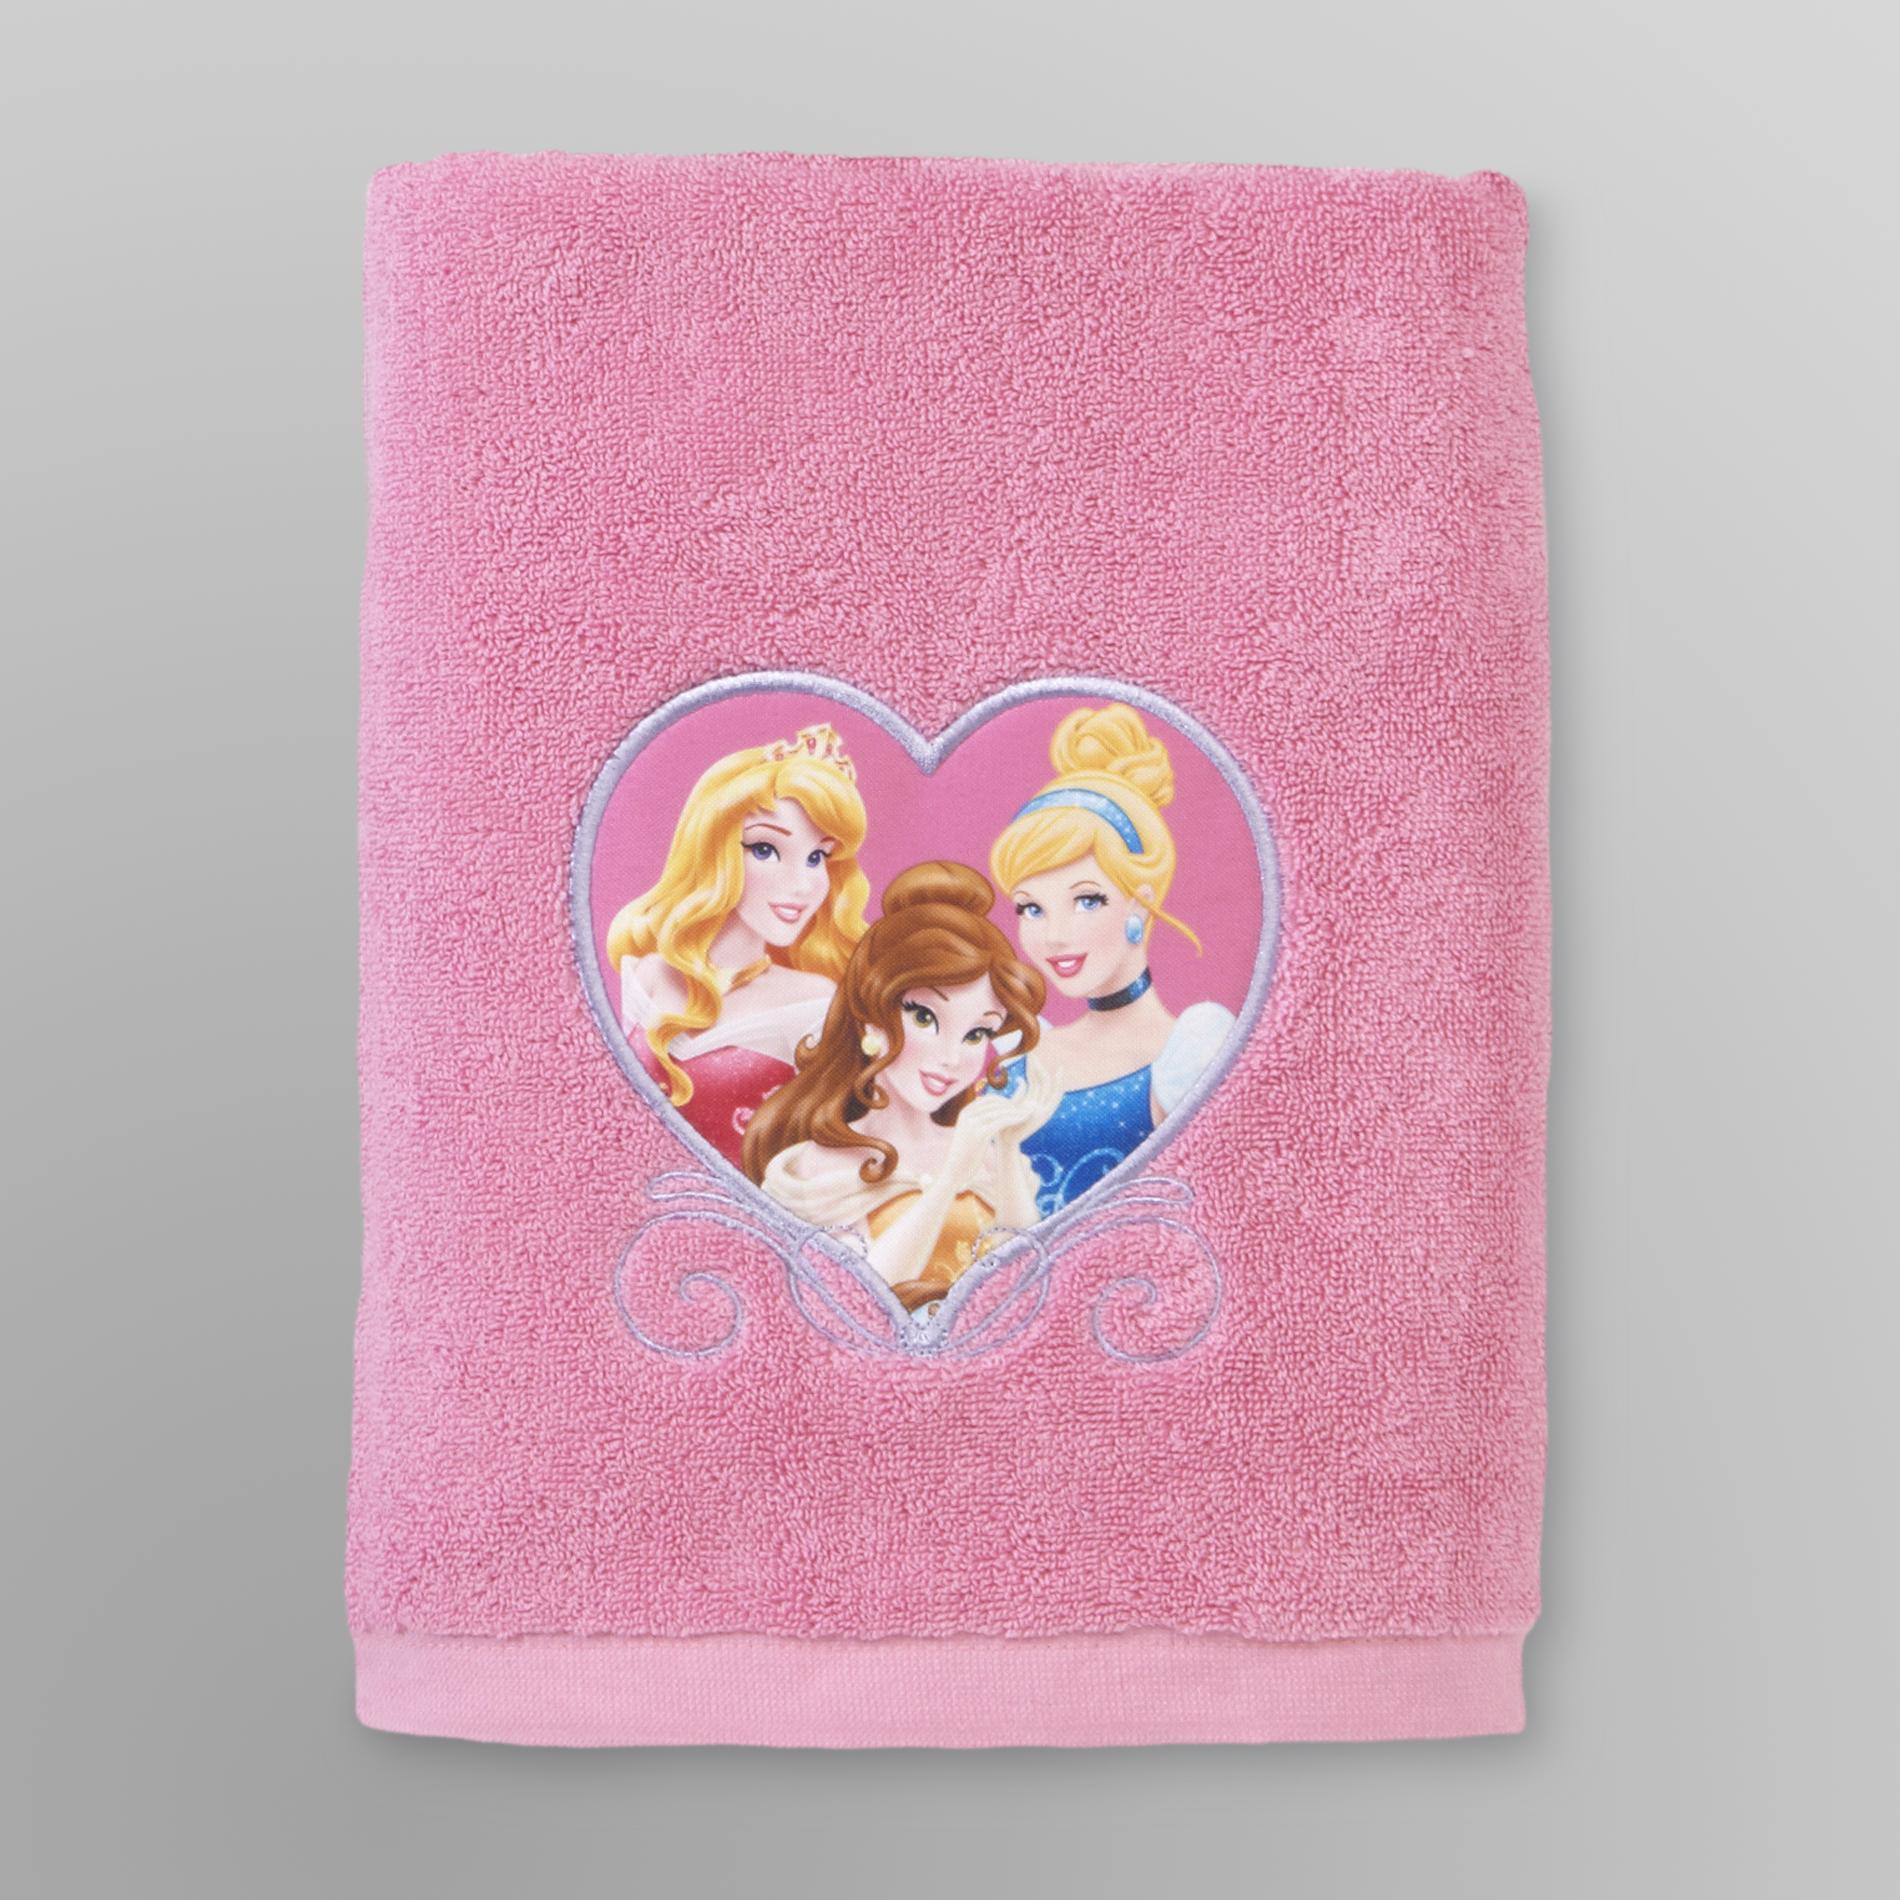 Disney Princess Girls Bath Towel Pink